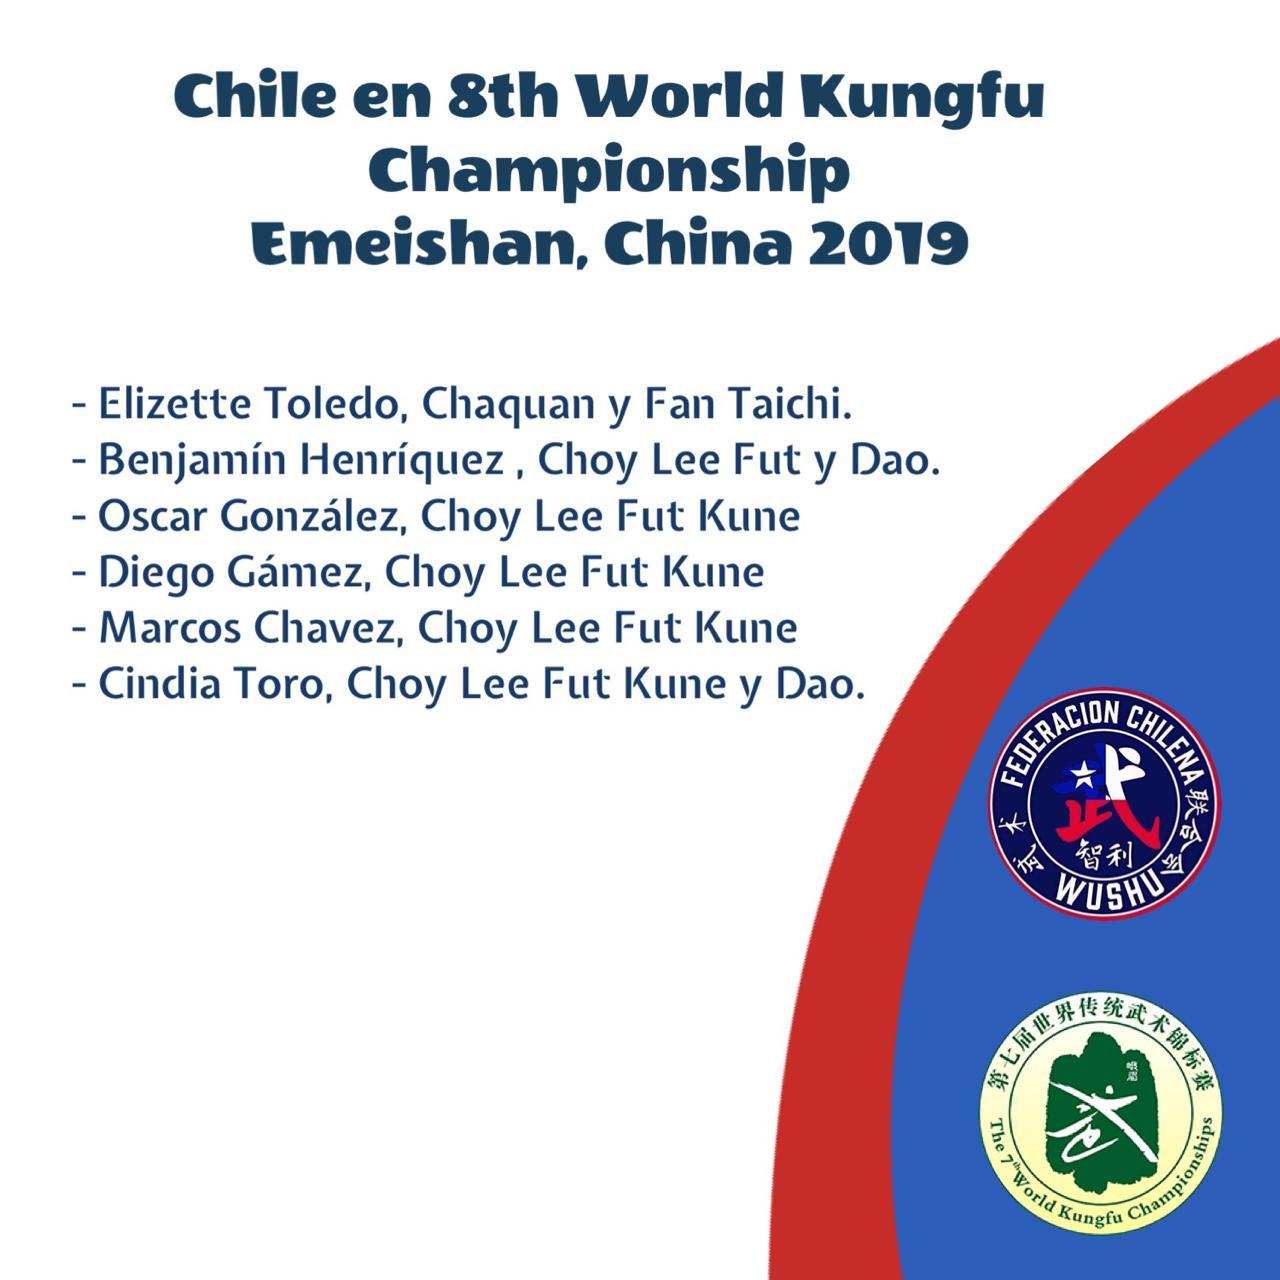 Mundial de Kungfu 2019